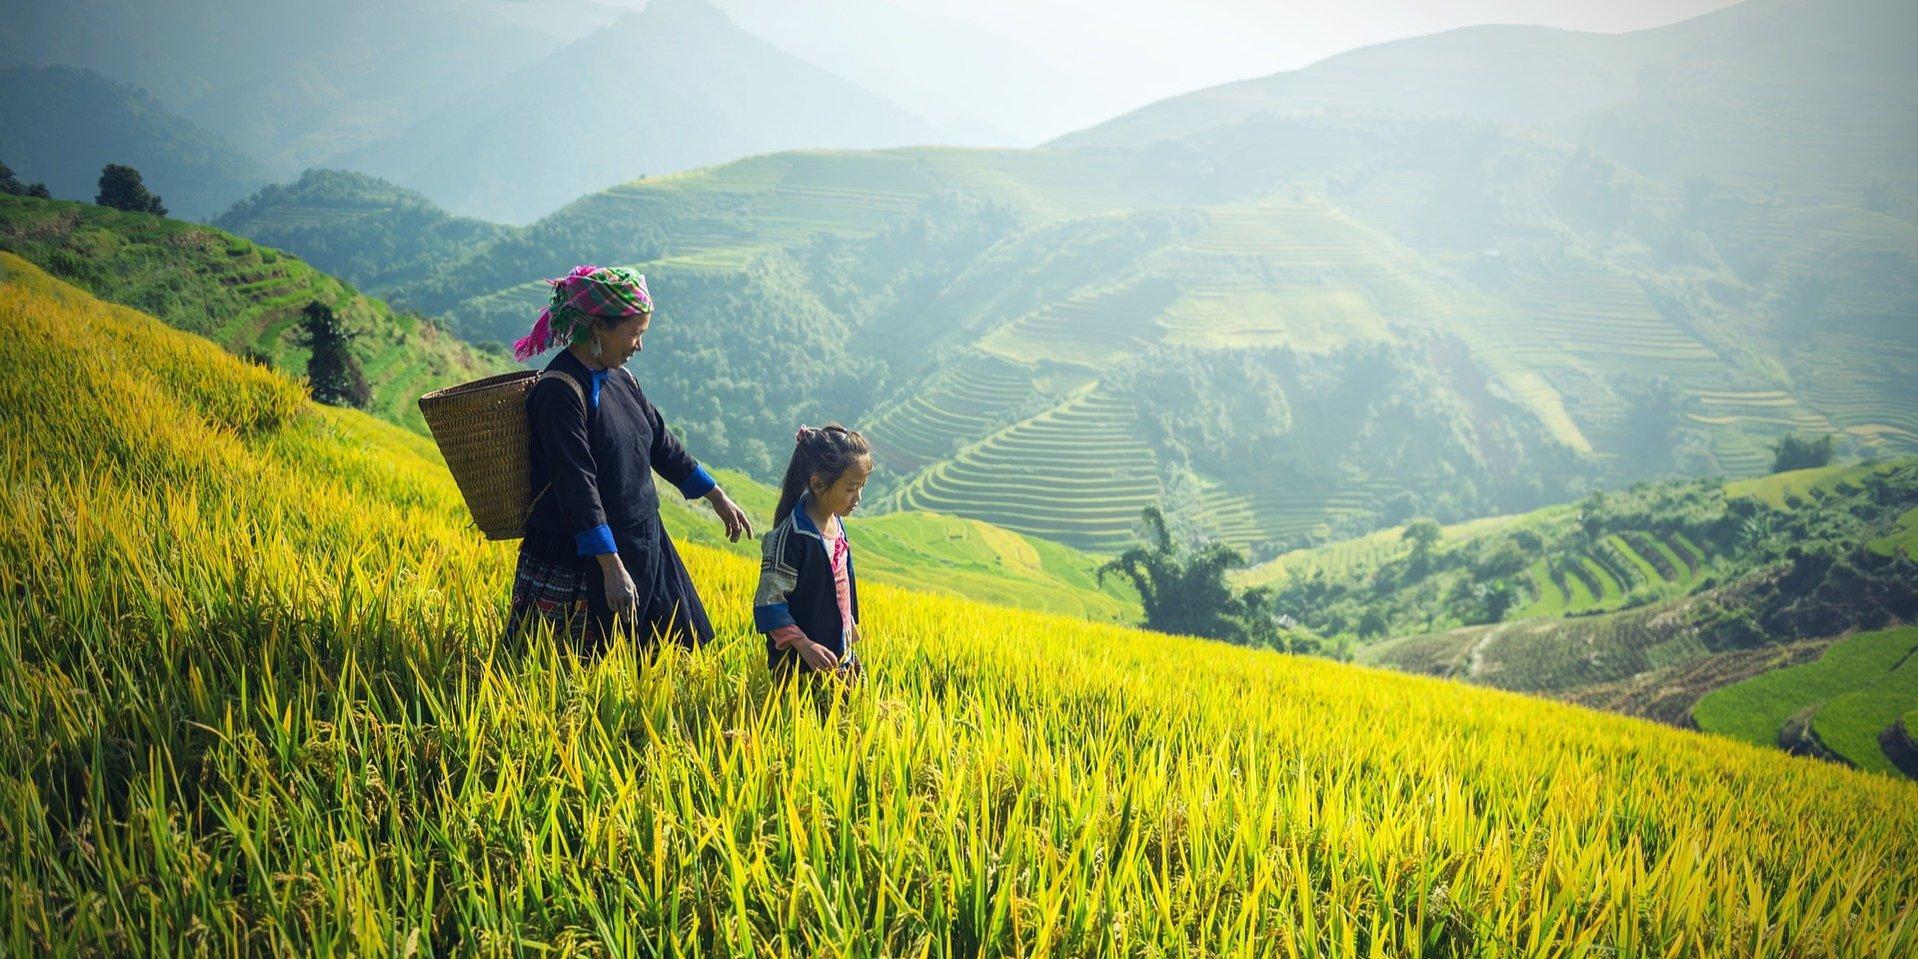 rice valley asiaventura sapa vietnam cut